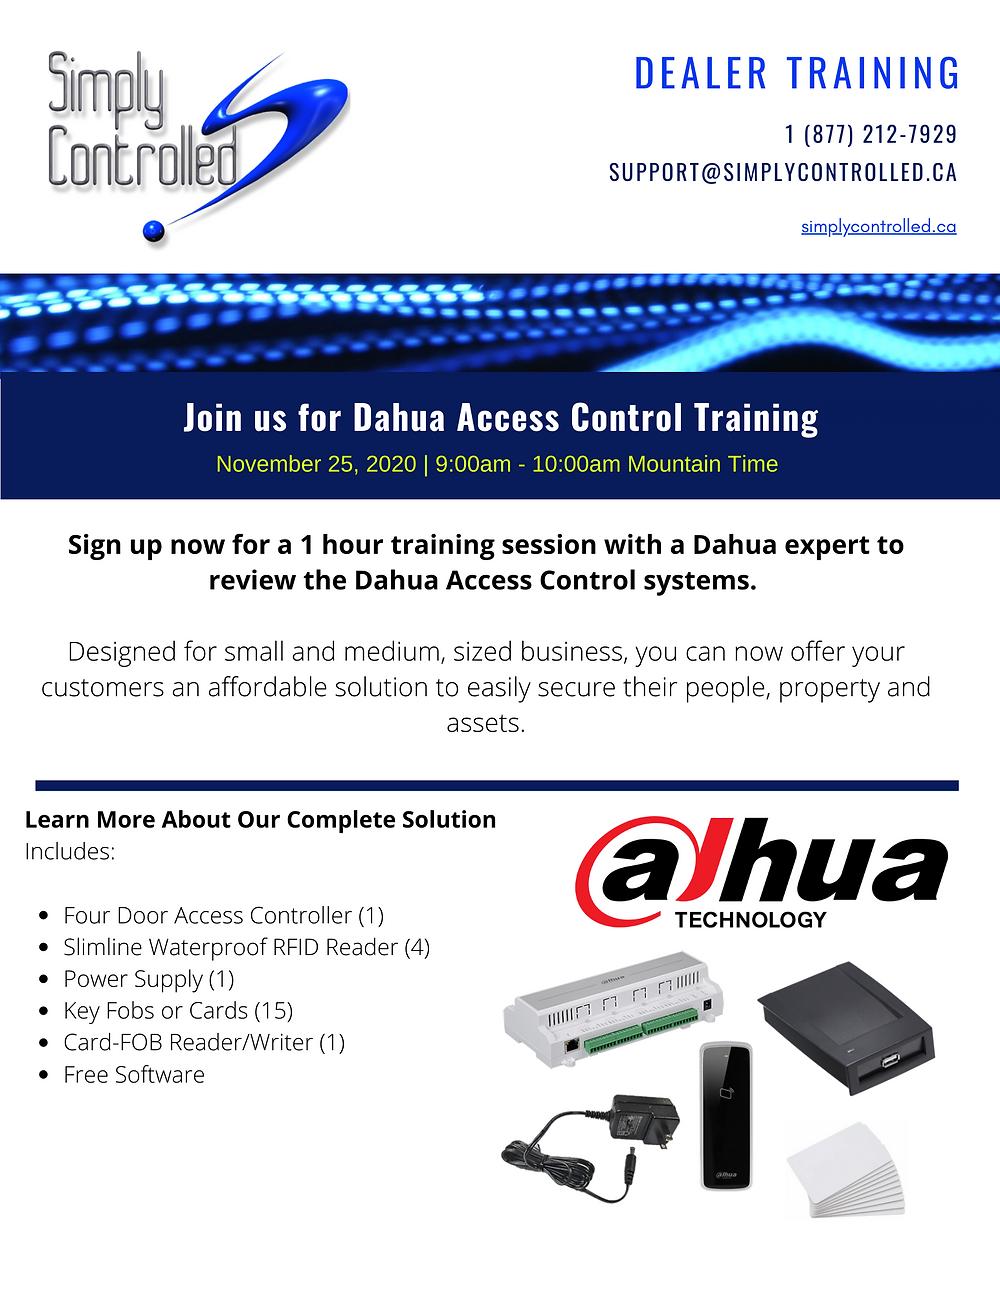 dahua, access control, security, dealer training, dealer education, webinar